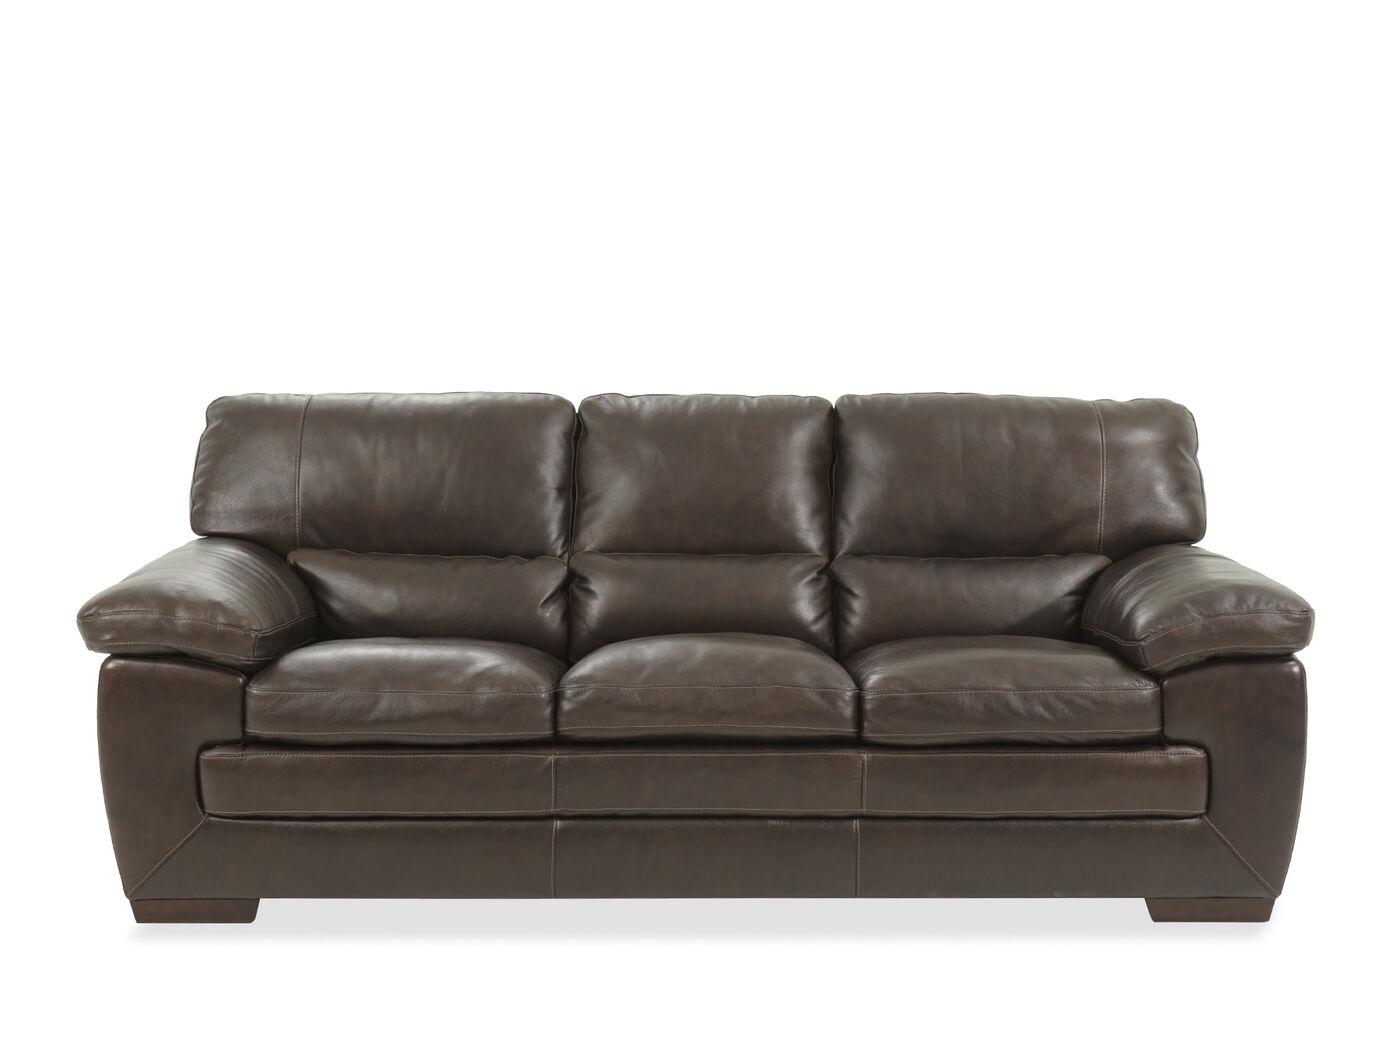 87 leather sofa in dark